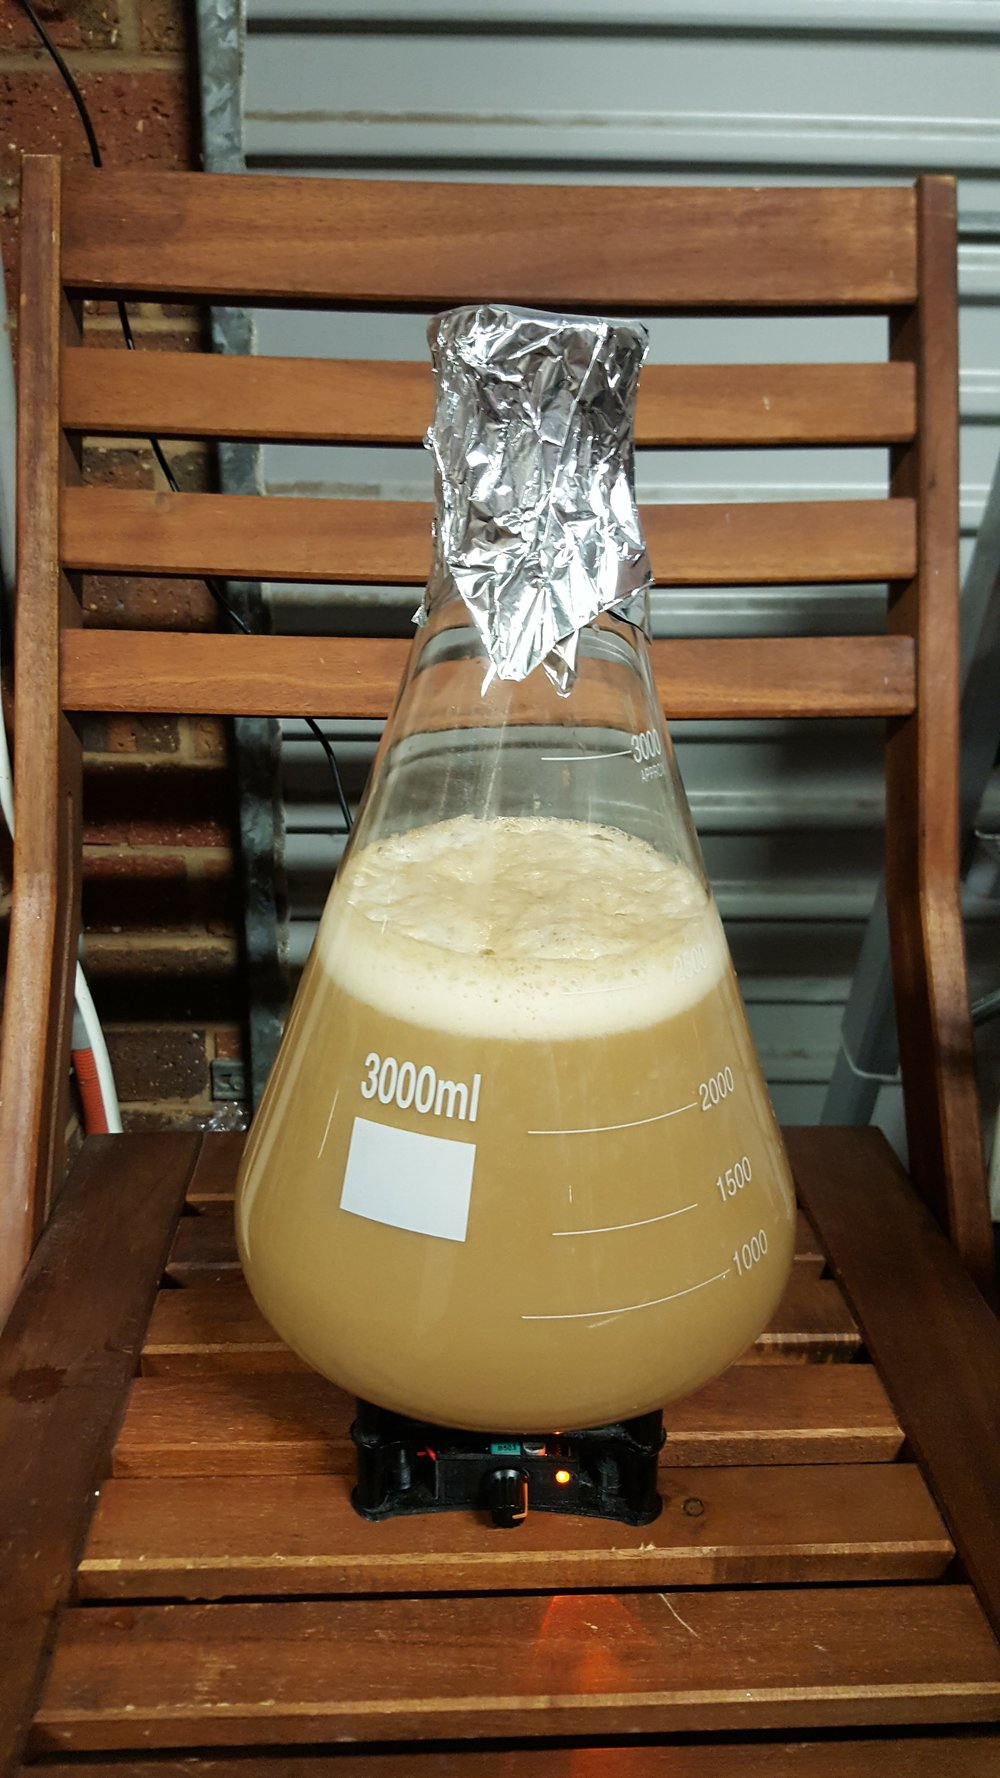 The Yeast Starter